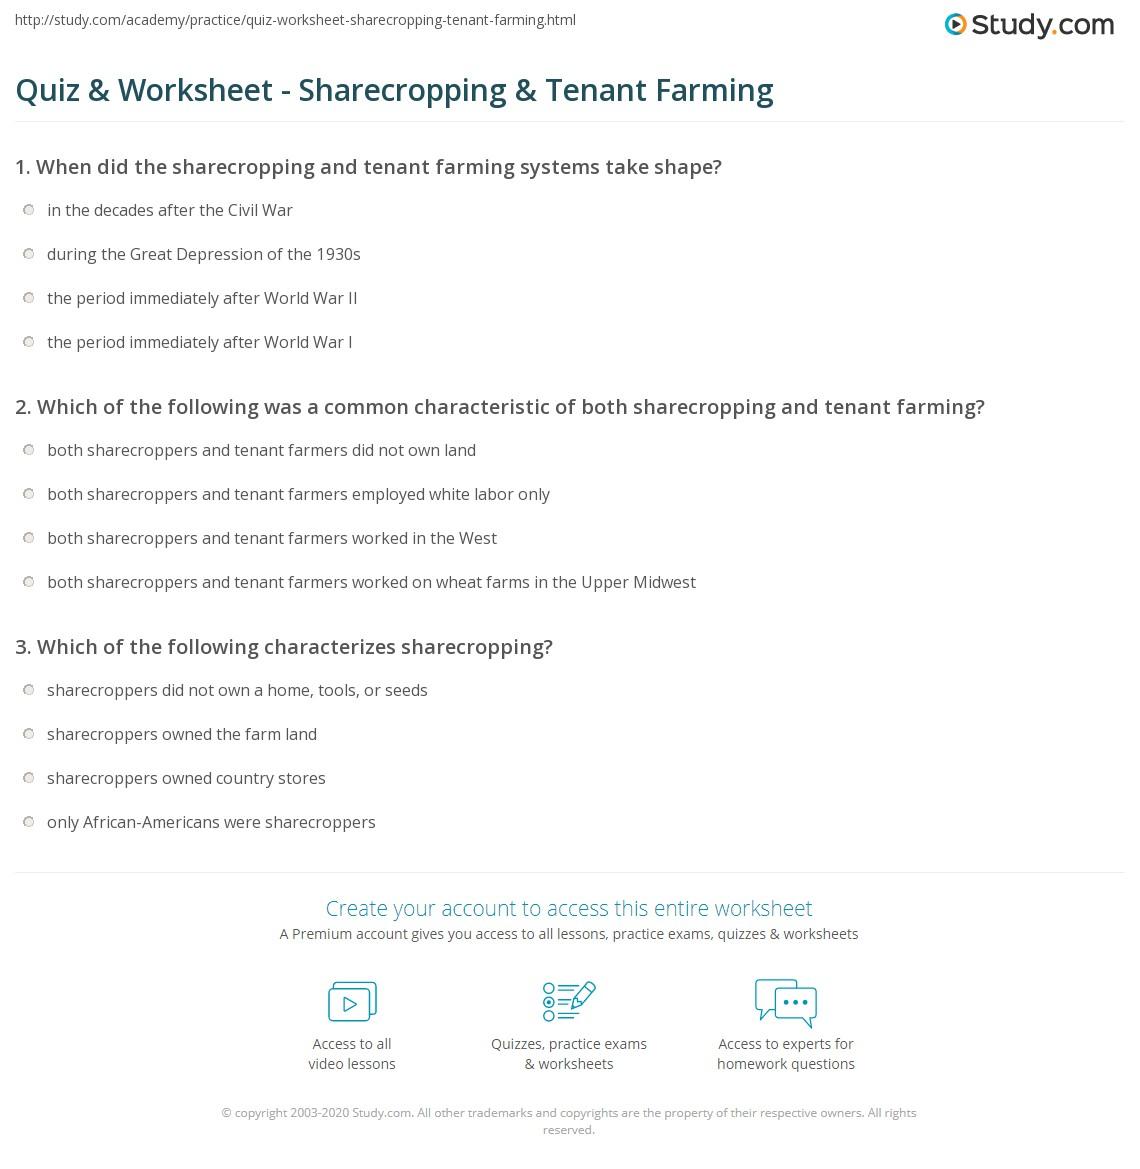 Quiz & Worksheet - Sharecropping & Tenant Farming   Study.com